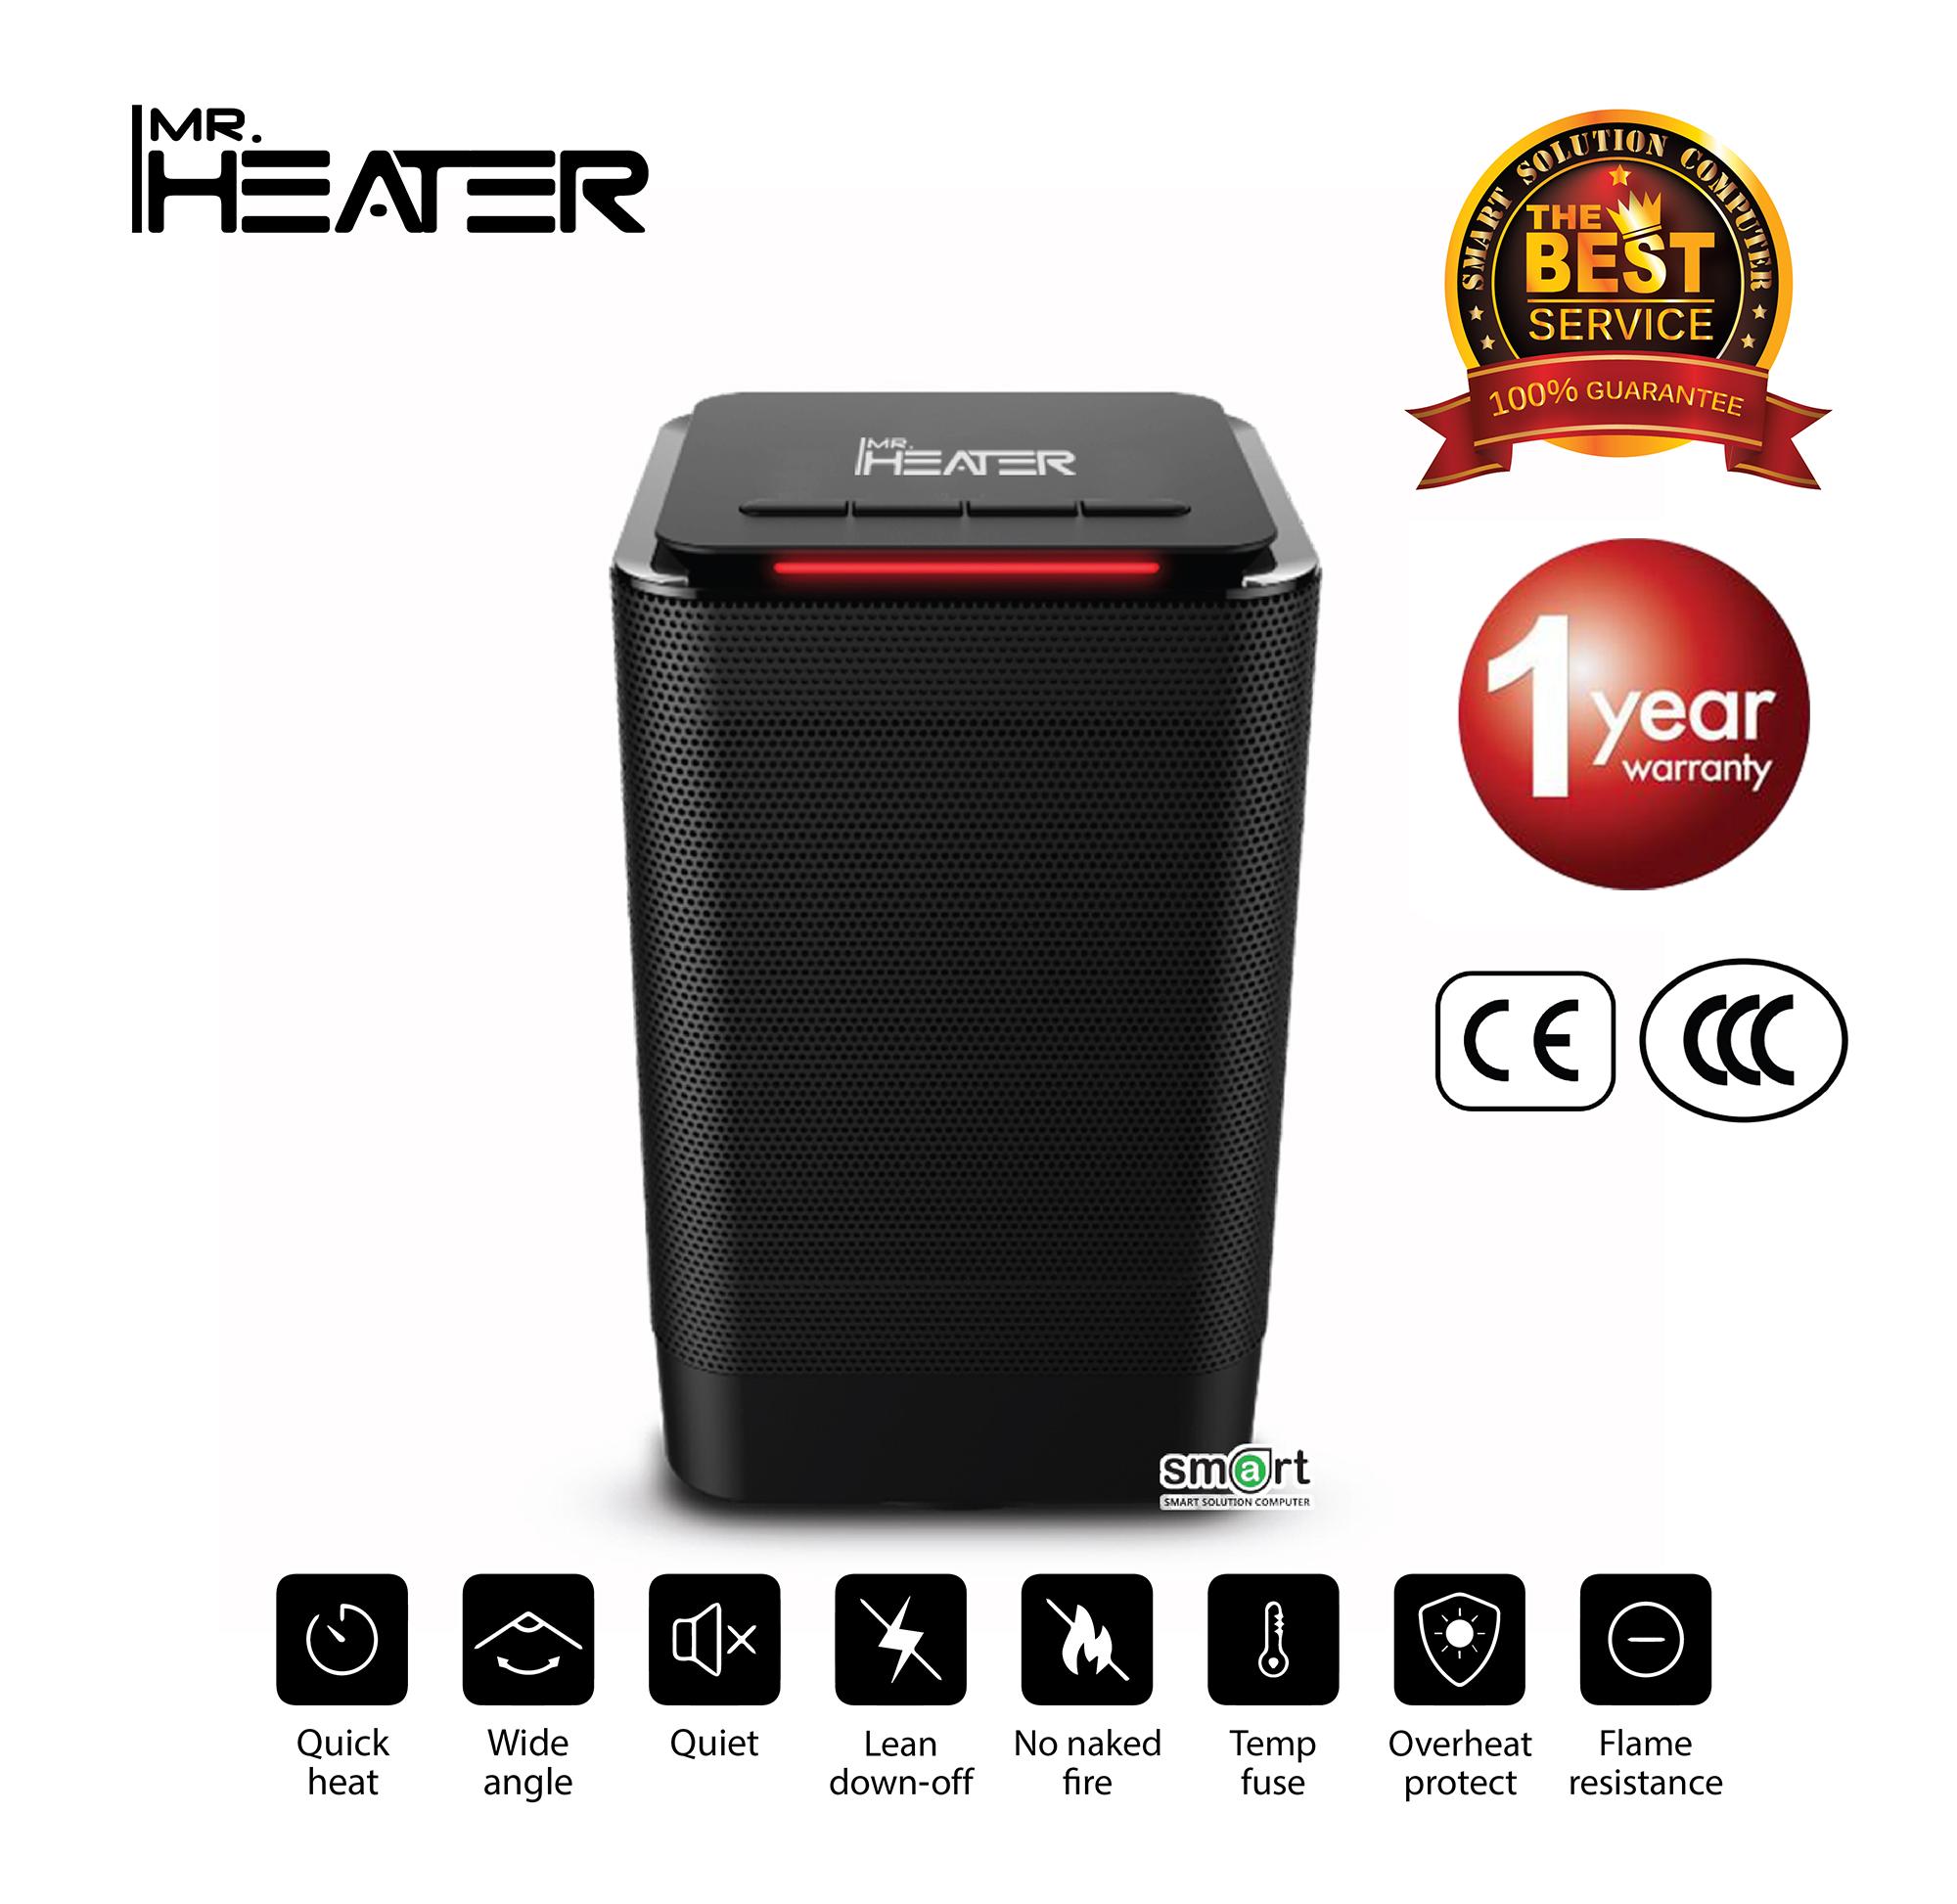 Mr.Heater พัดลมทำความร้อน ฮีทเตอร์ไฟฟ้า รุ่น DH-QN02 (สีดำ)